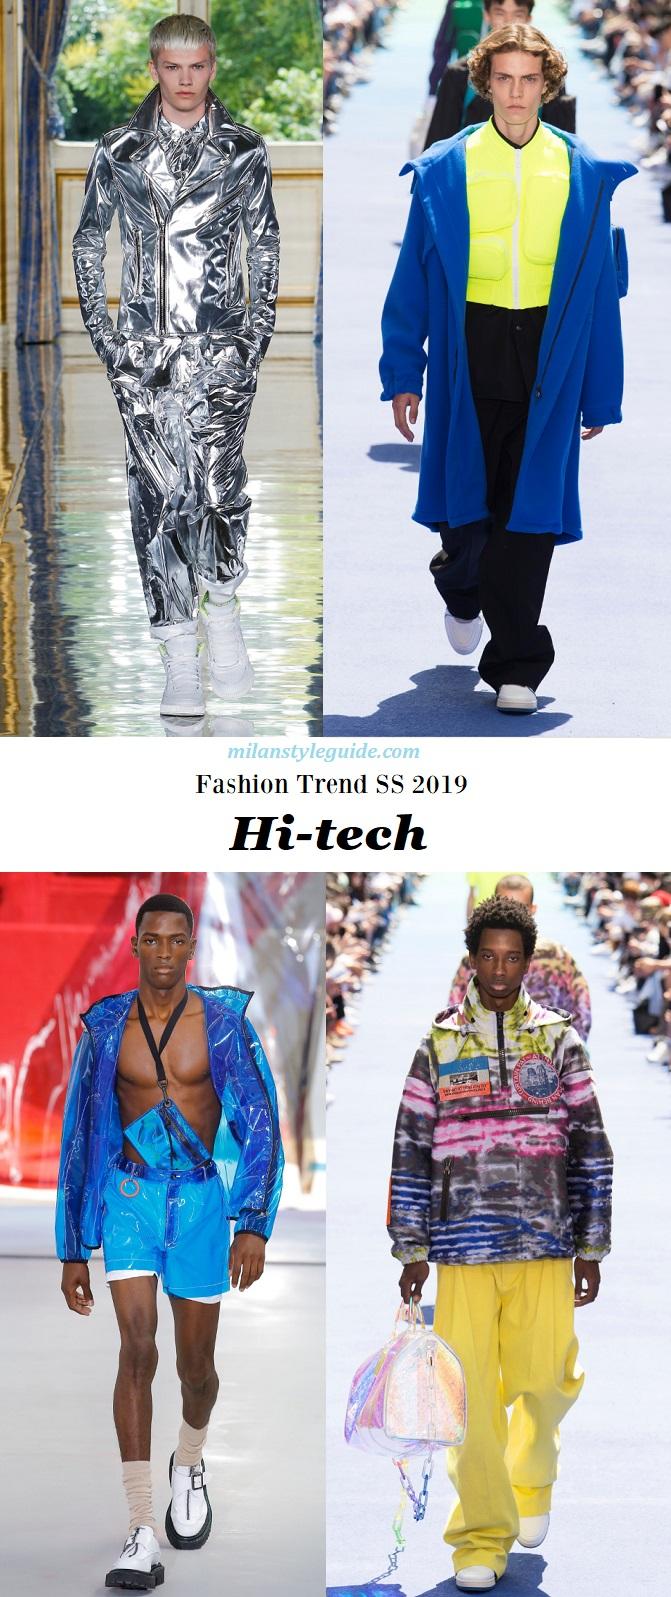 Fashion trend men 2019 Hi-tech модная тенденции 2019